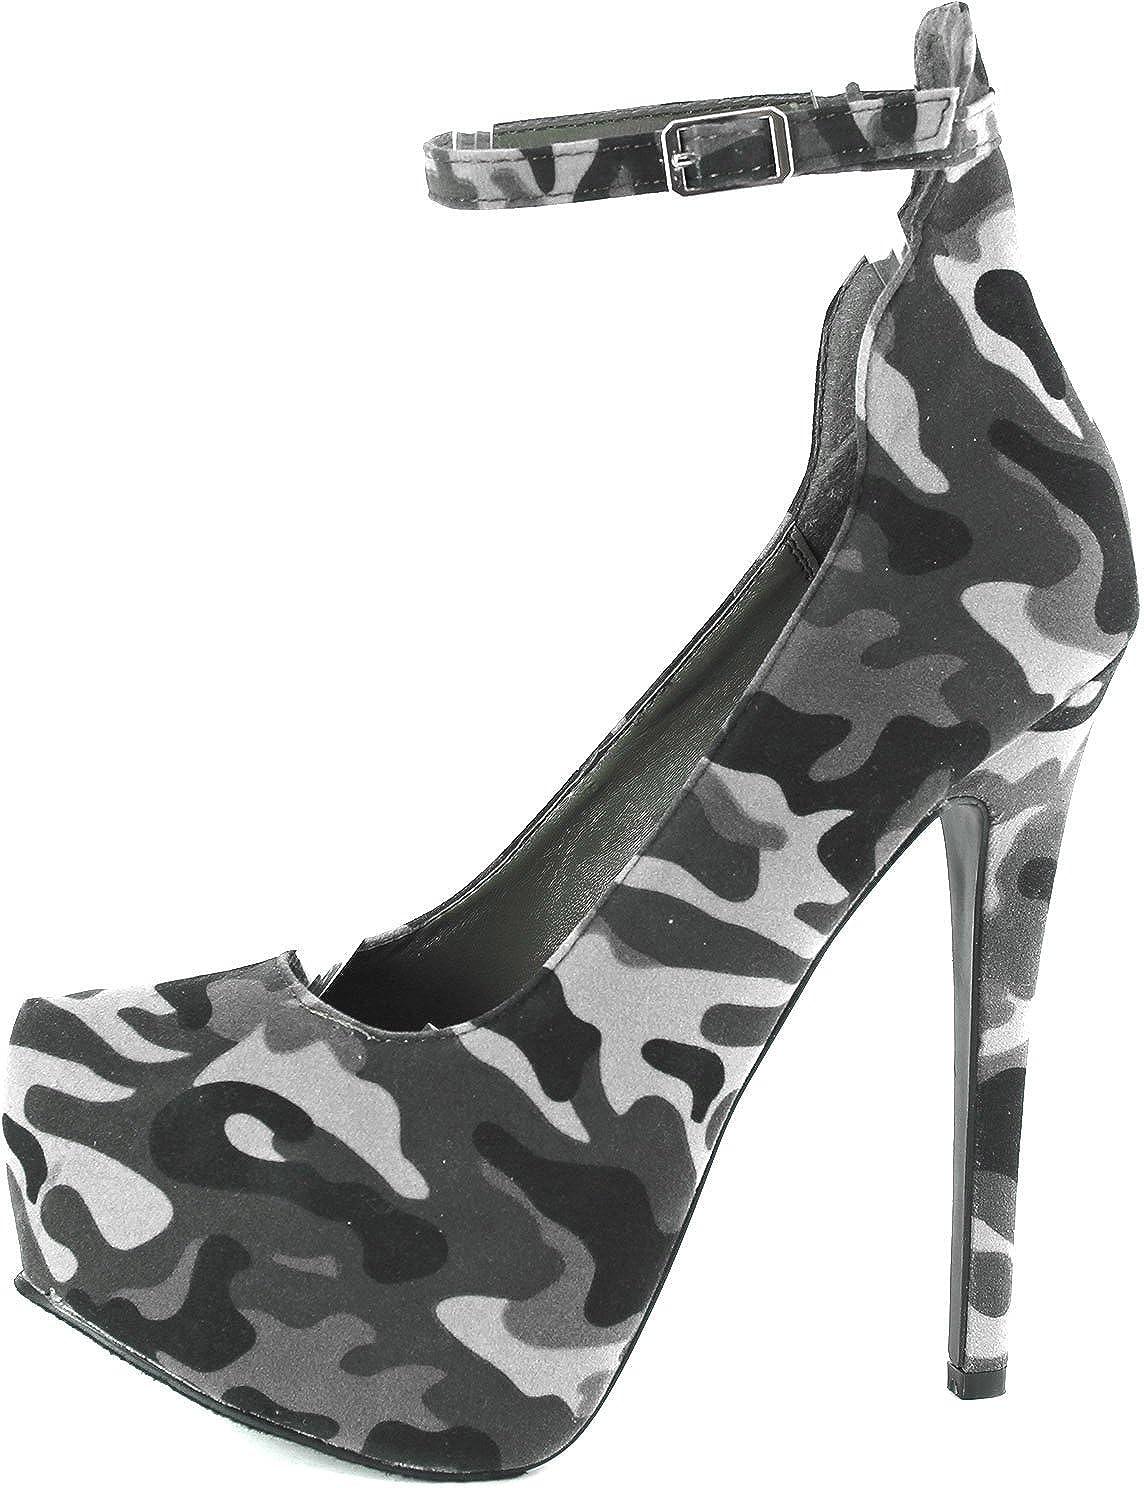 11a48175fe9 Breckelles Women s MARISA-34 Platform High Heel Stiletto Ankle Strap Pump